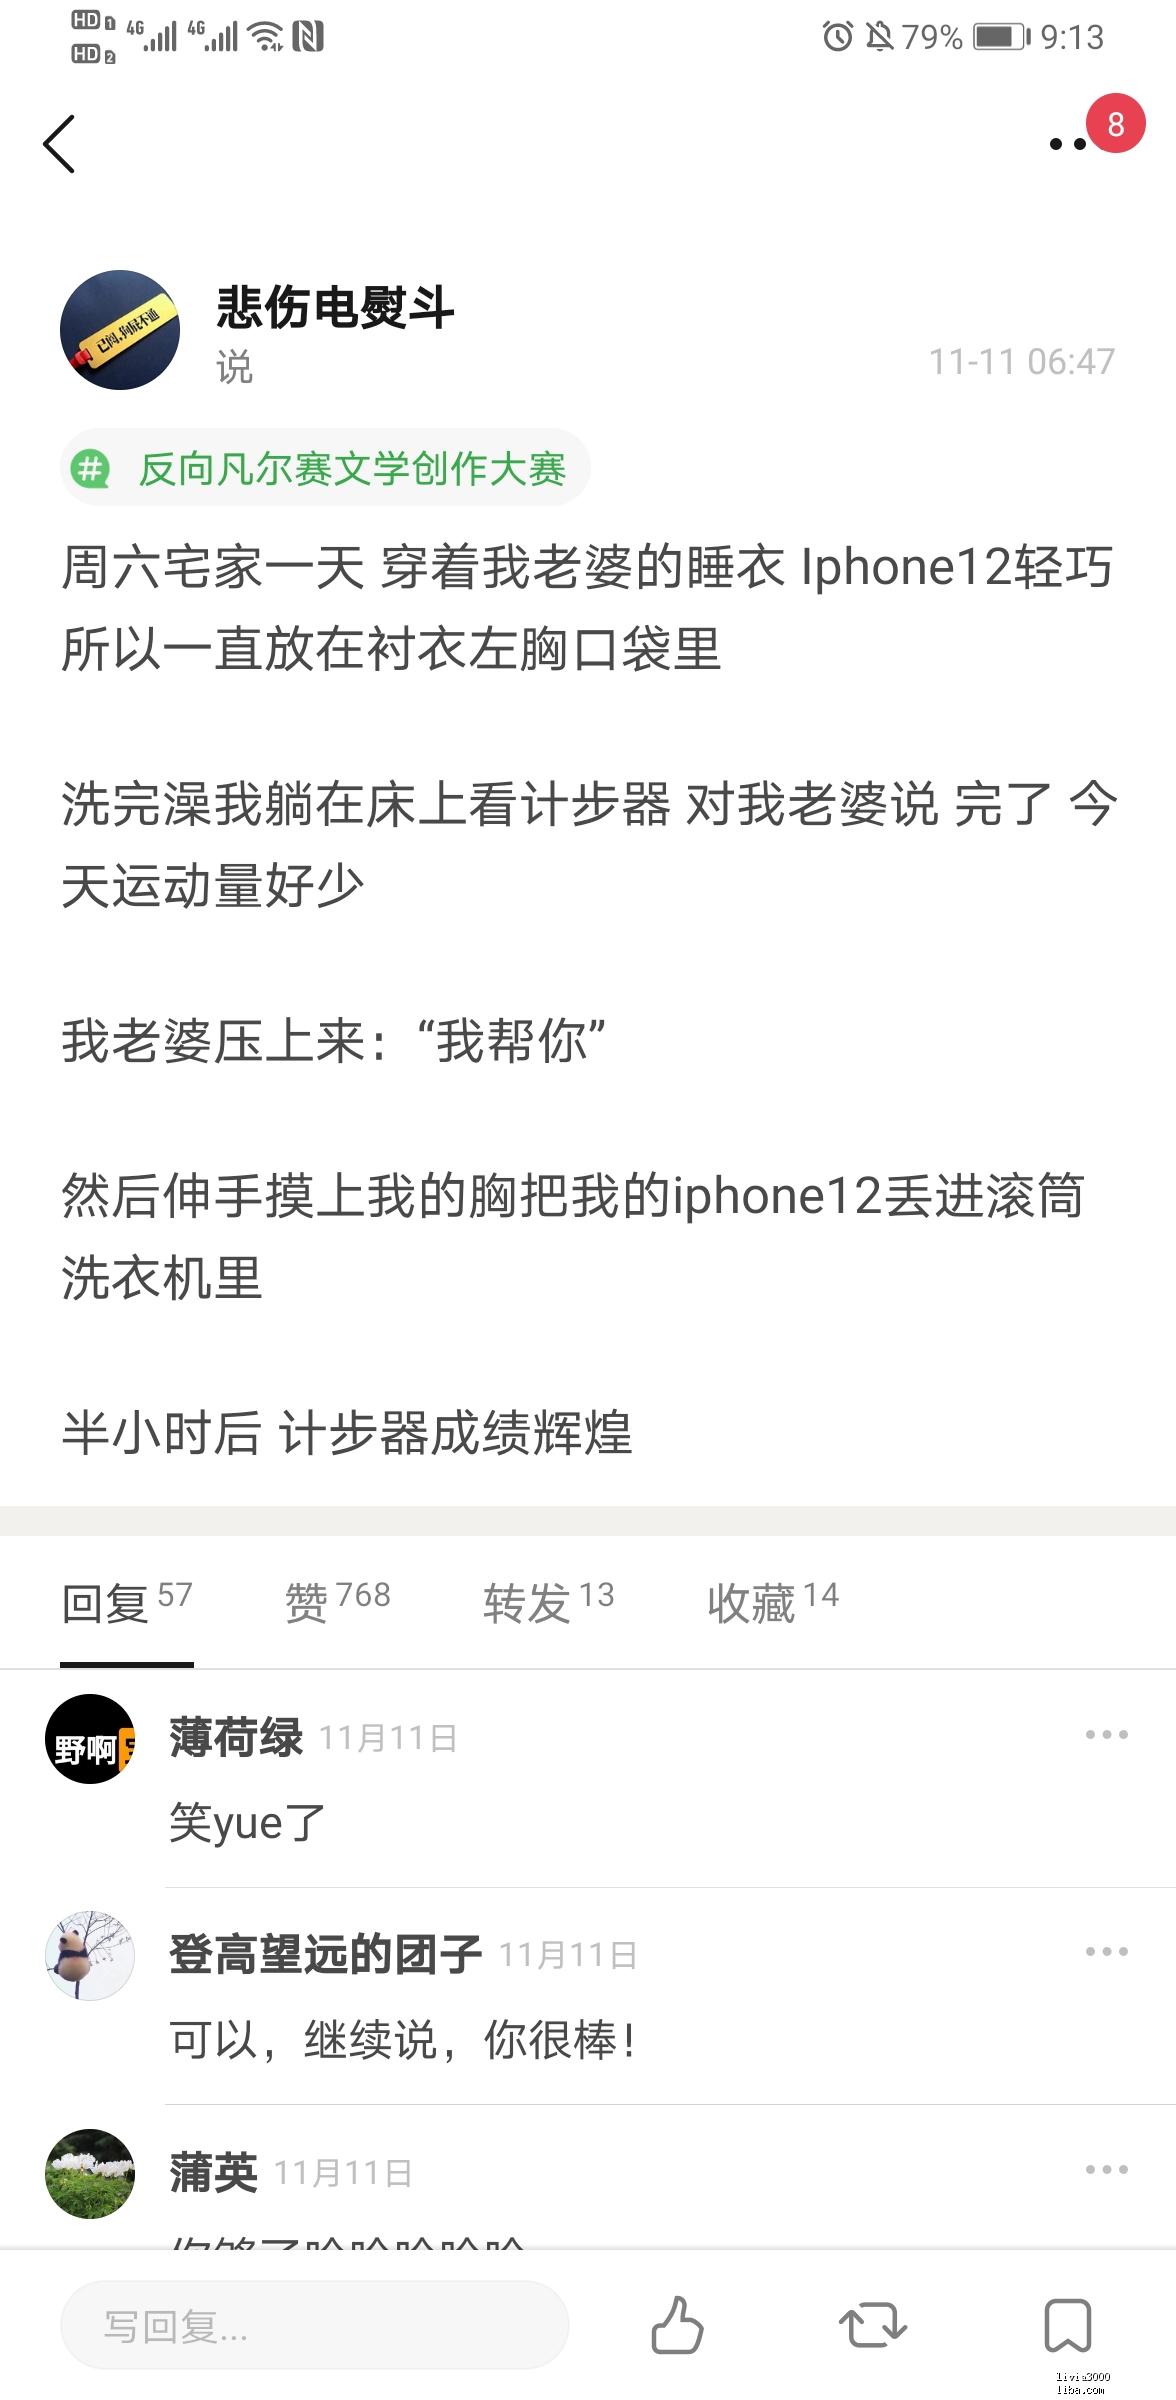 Screenshot_20201119_091339_com.douban.frodo.jpg